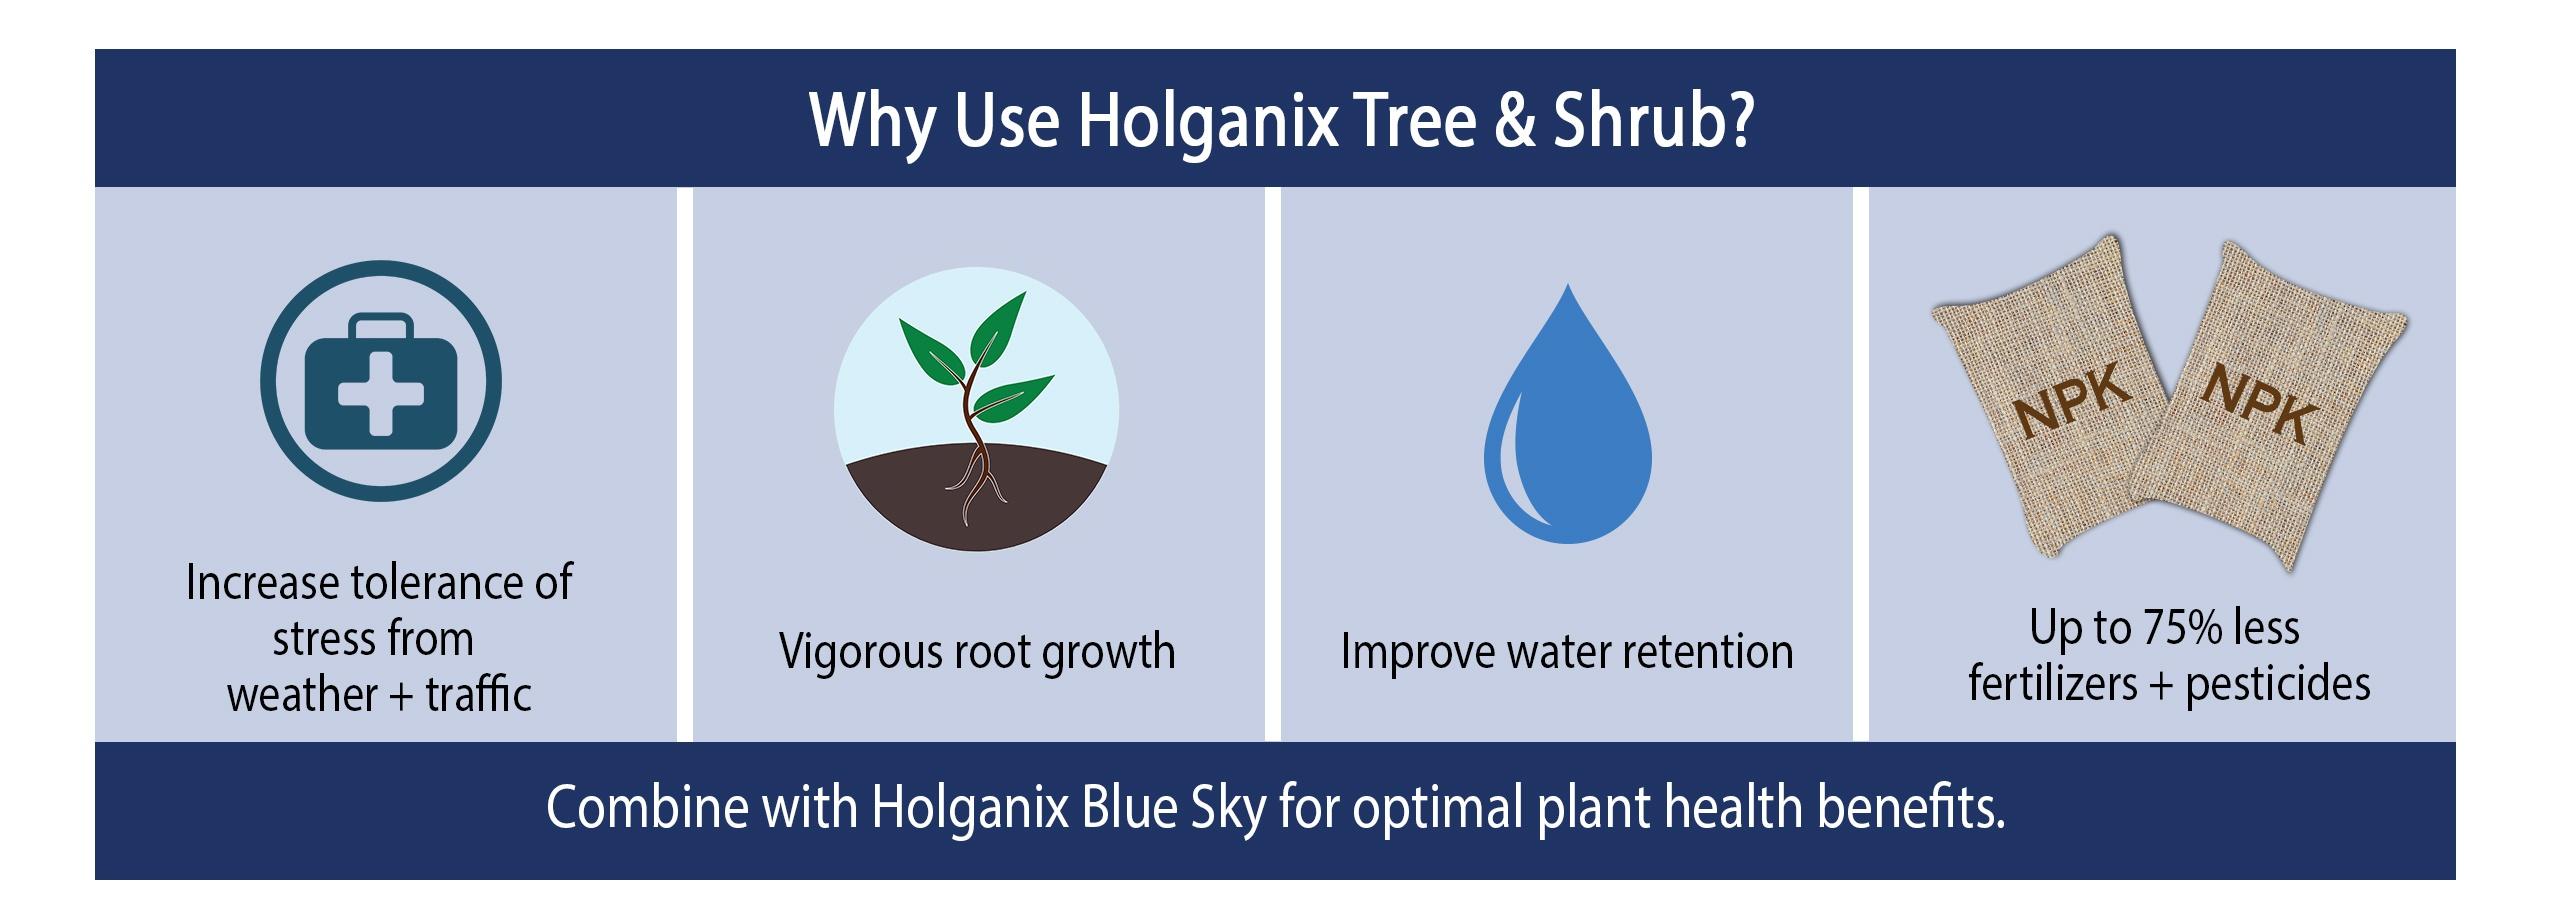 WA Why use Holganix t and s.jpg